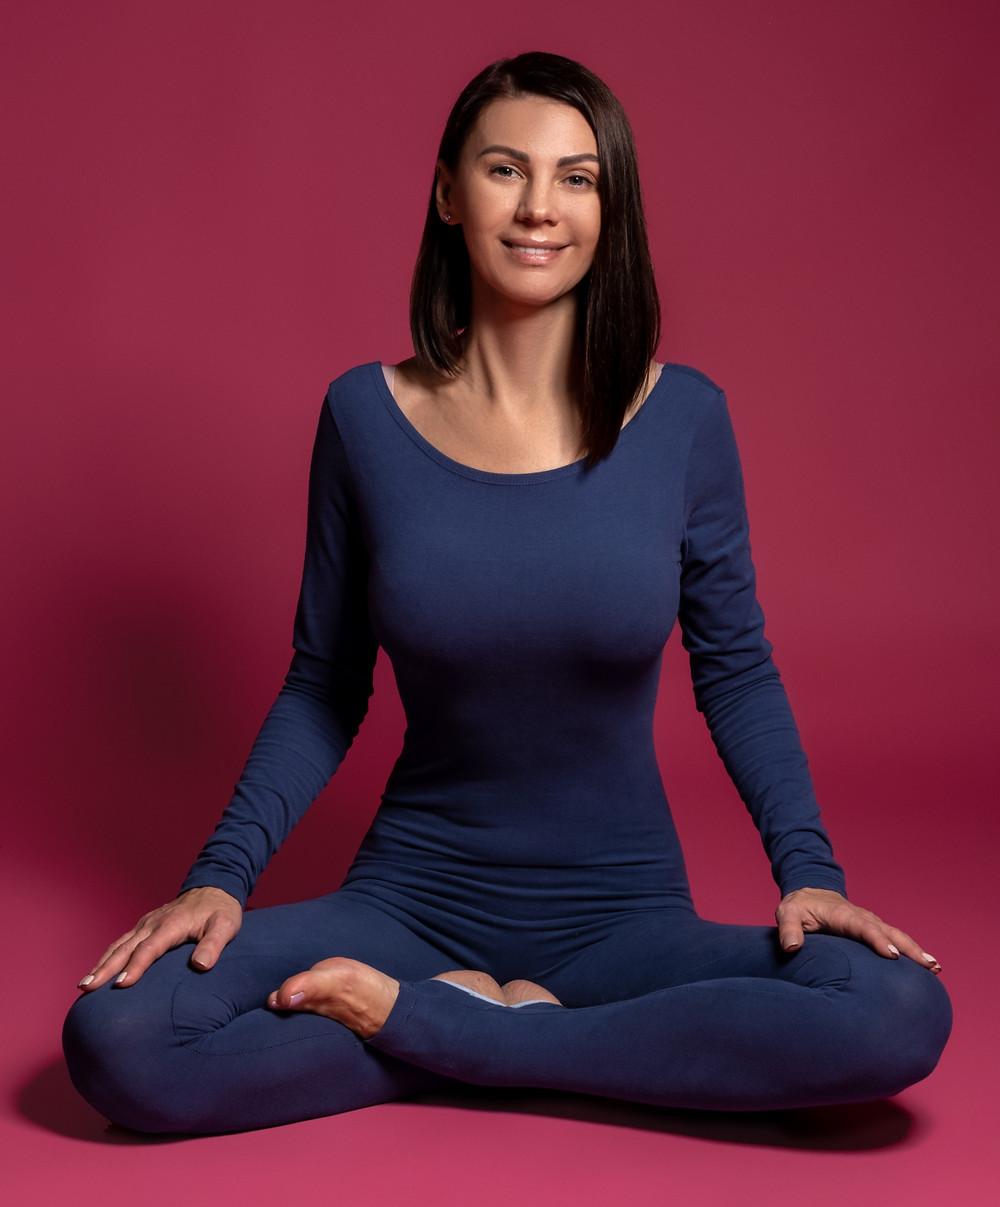 Yoga woman doing pranayama in Siddhasana